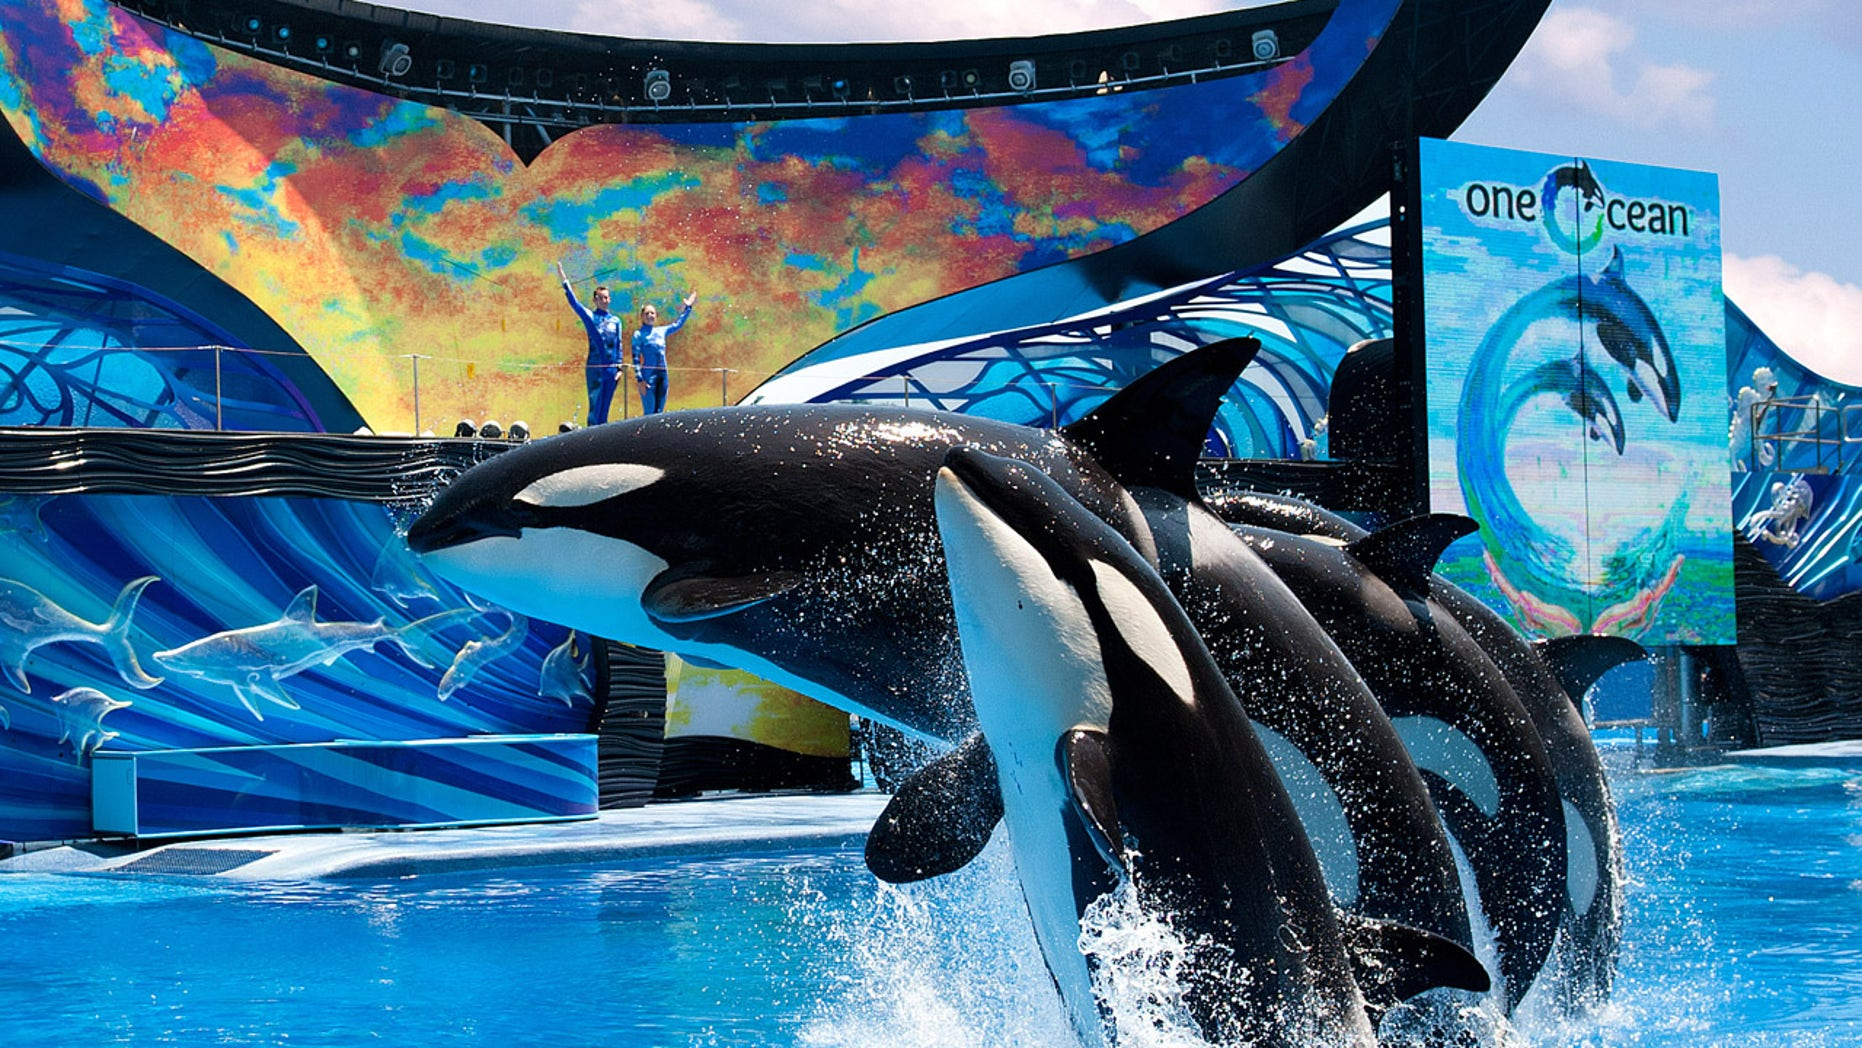 SeaWorld's new Shamu show One Ocean.